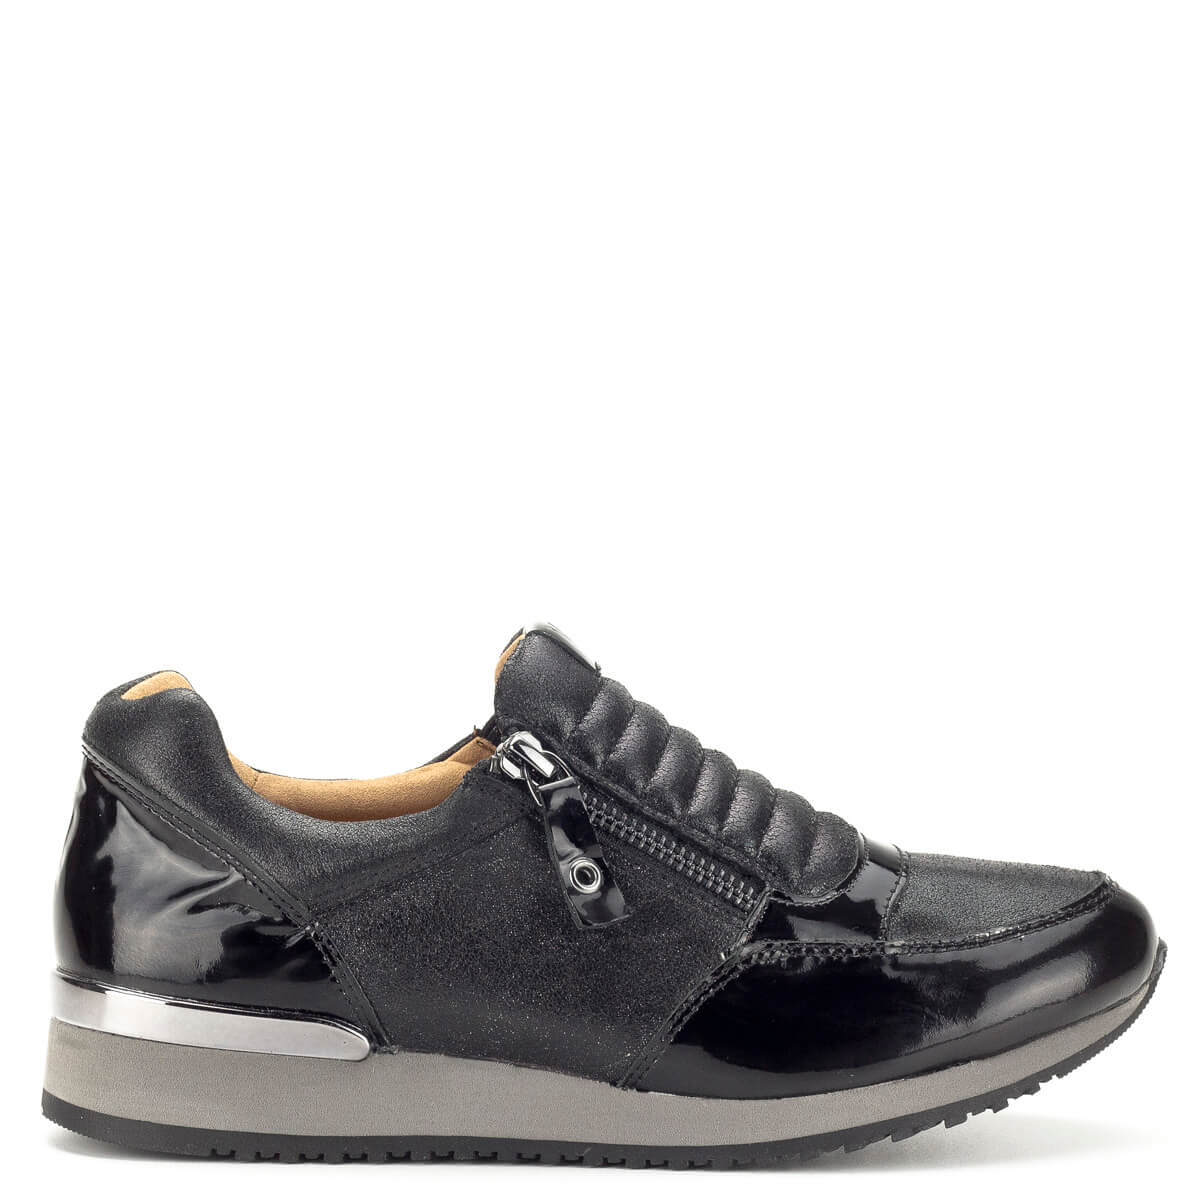 ... Fekete sportos Caprice női cipő - Caprice cipők - Utcai cipők - Caprice  9-24605 ... 39df50d0c3